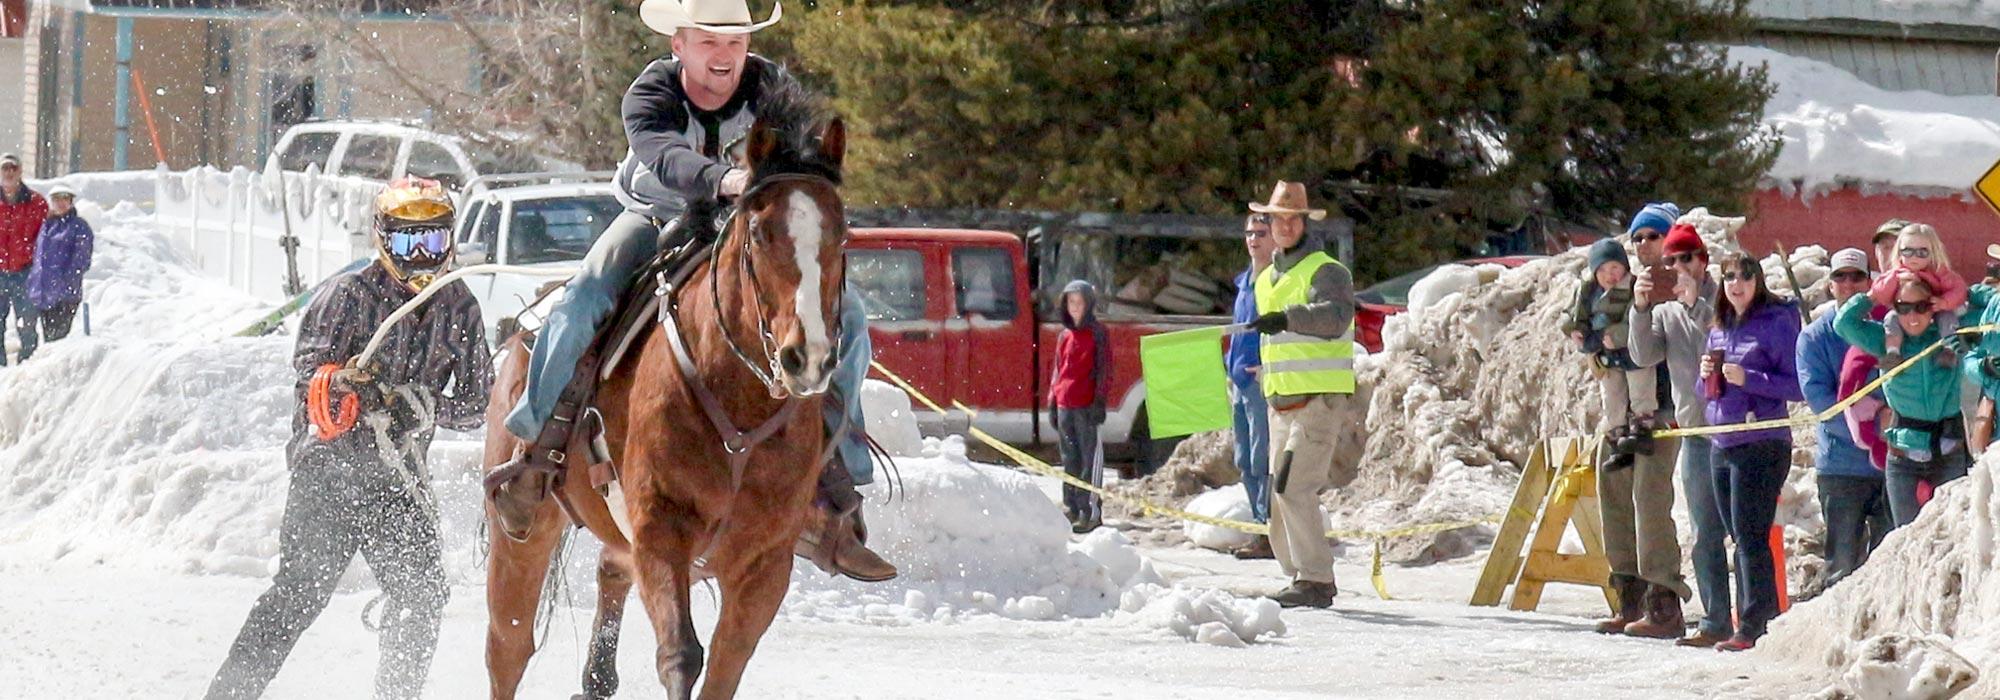 Lewistown Fair 2020.Montana Winter Fair Skijoring